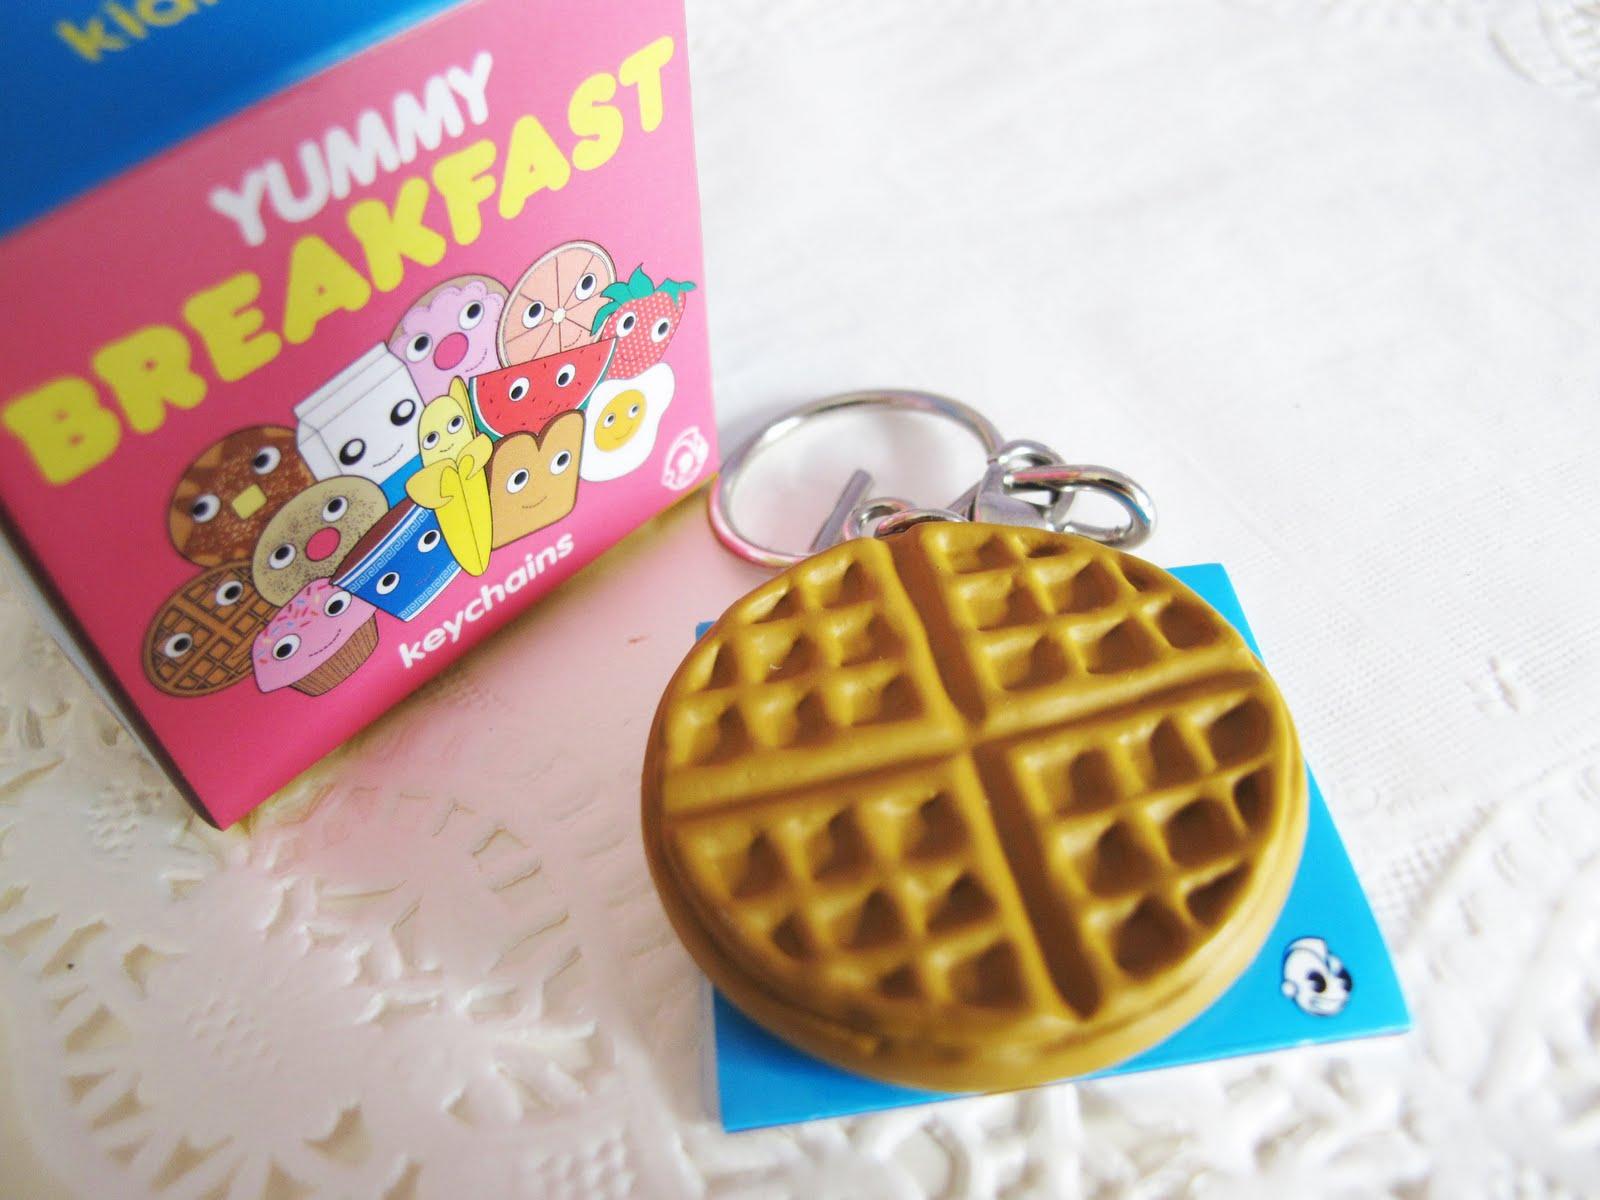 xoxo et cetera yummy breakfast charm keychains